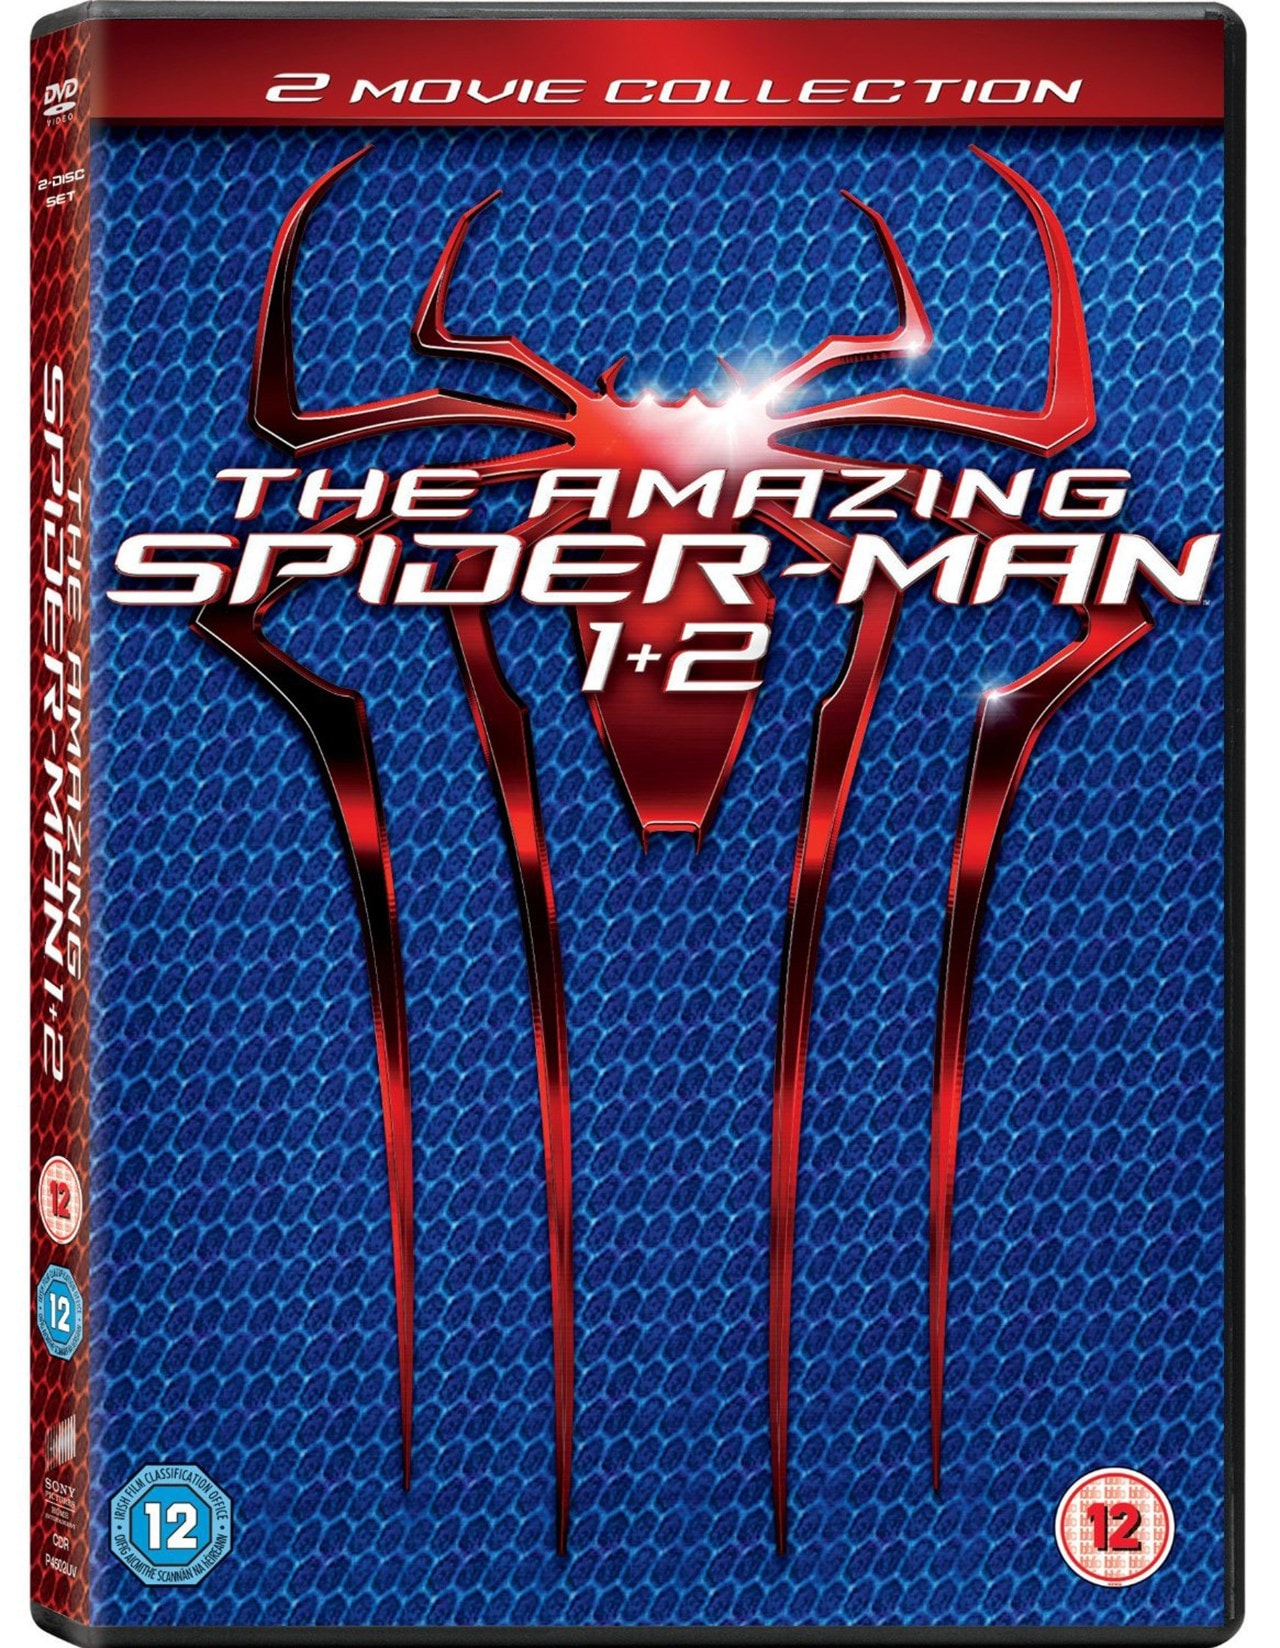 The Amazing Spider-Man/The Amazing Spider-Man 2 - 1